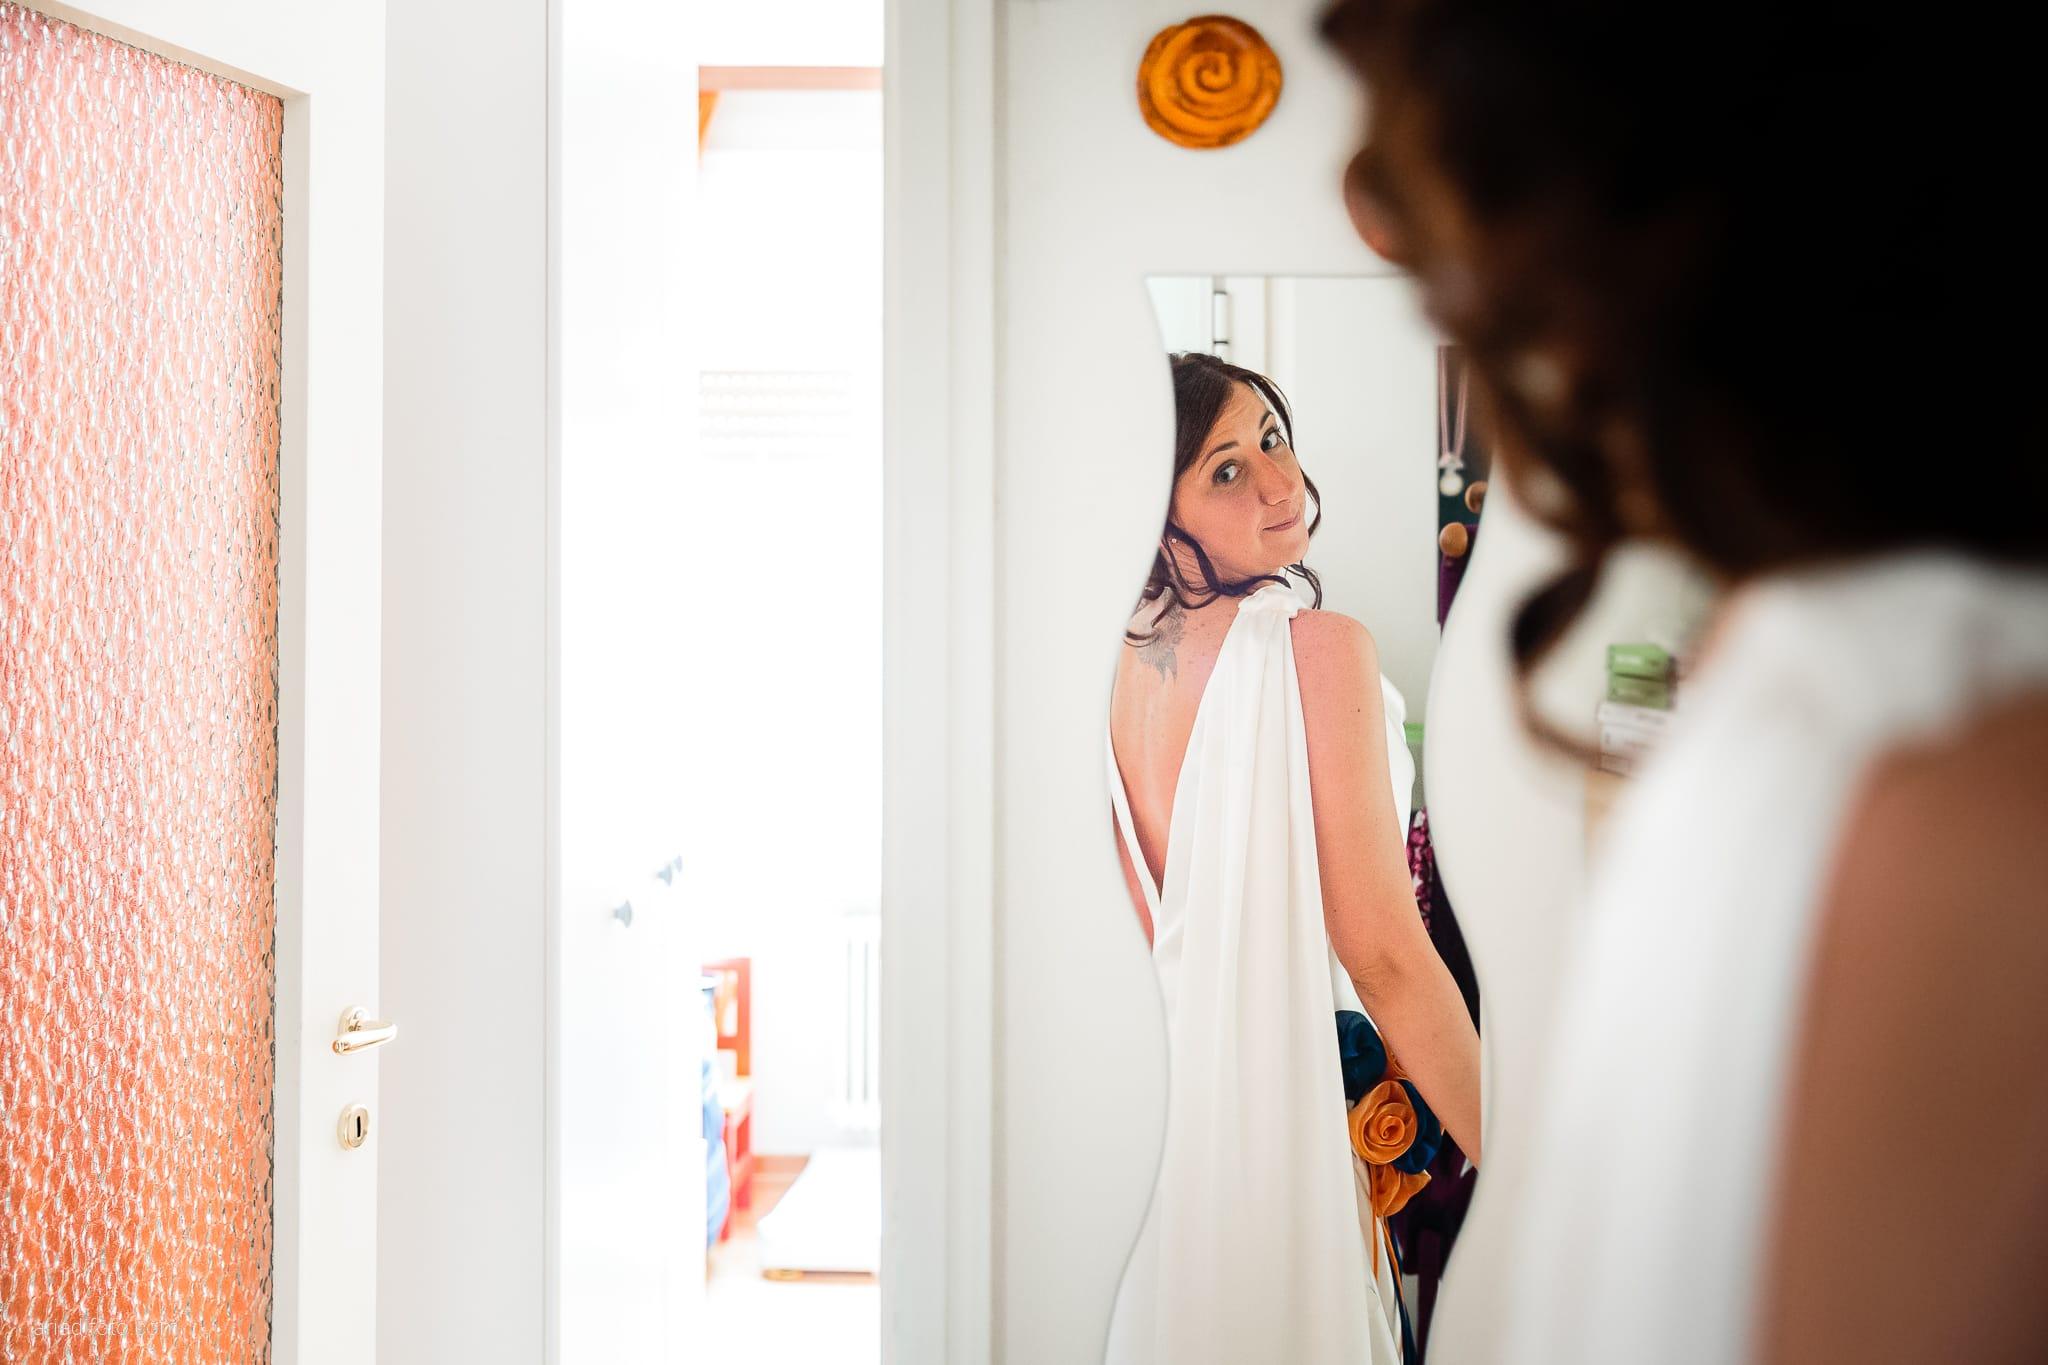 Elisa Diego matrimonio Villa Revoltella Trieste Paradiso Pocenia Udine preparativi specchio riflesso